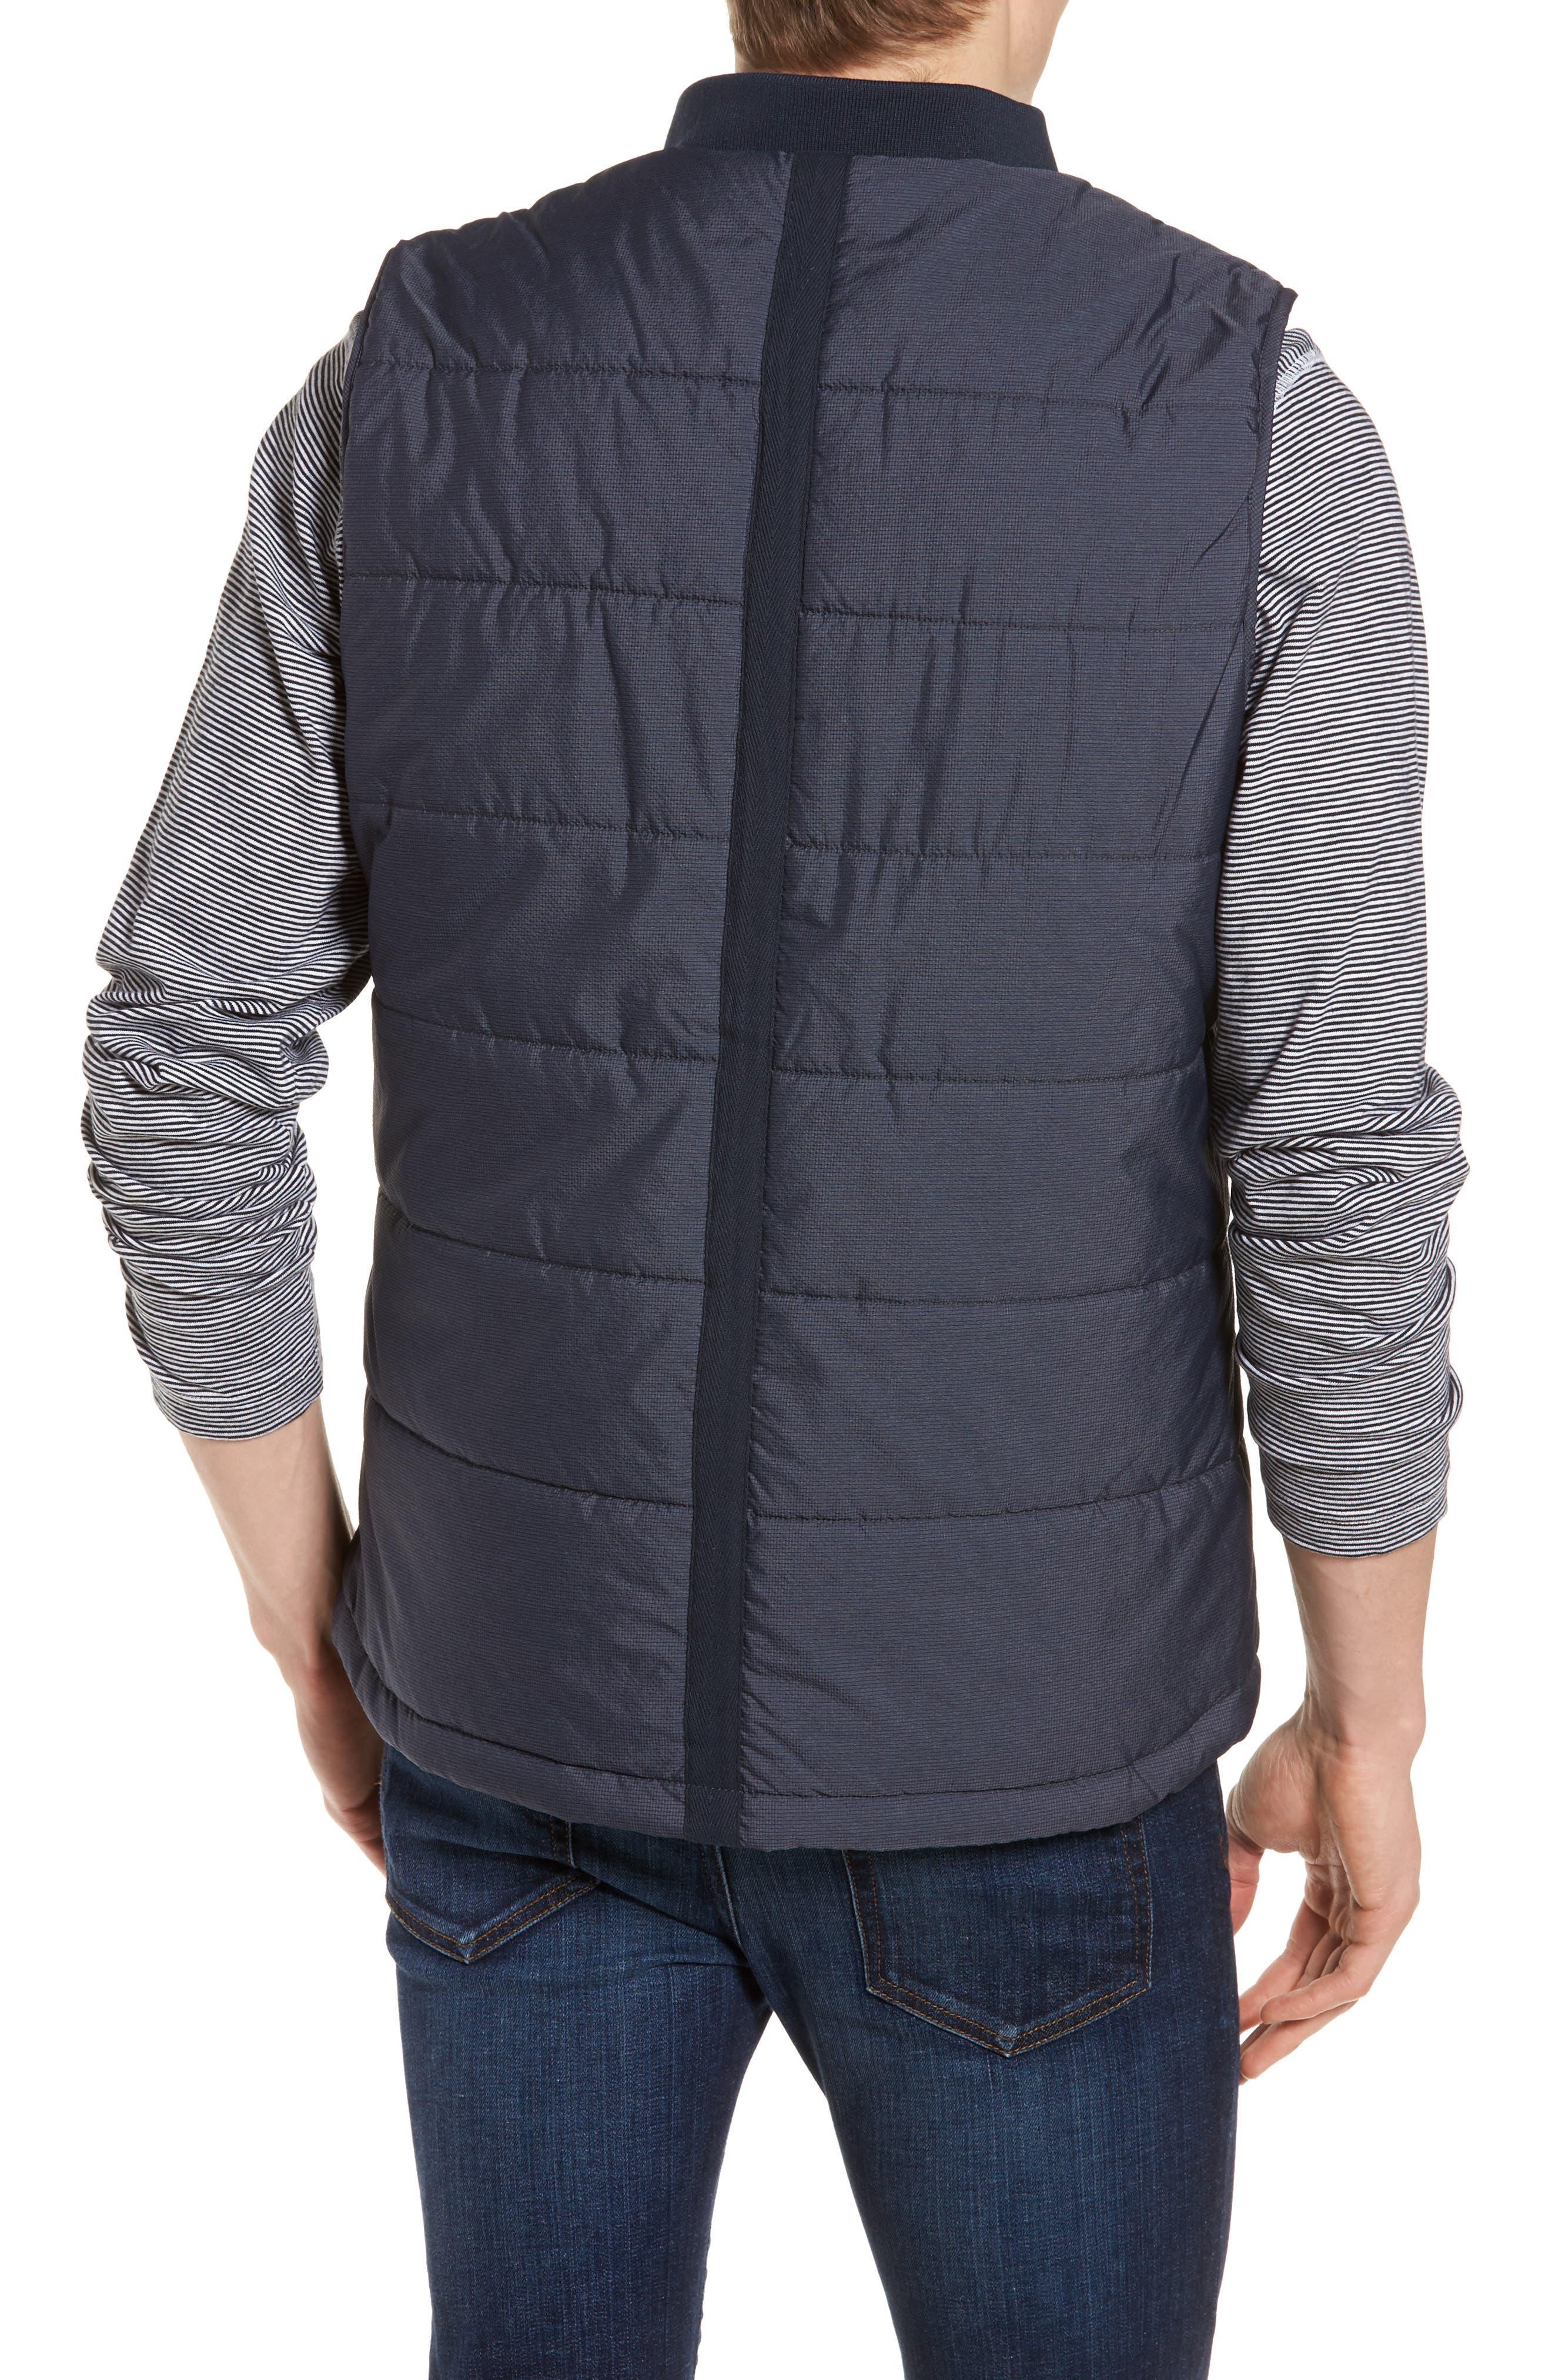 Foley Vest,                             Alternate thumbnail 2, color,                             Navy